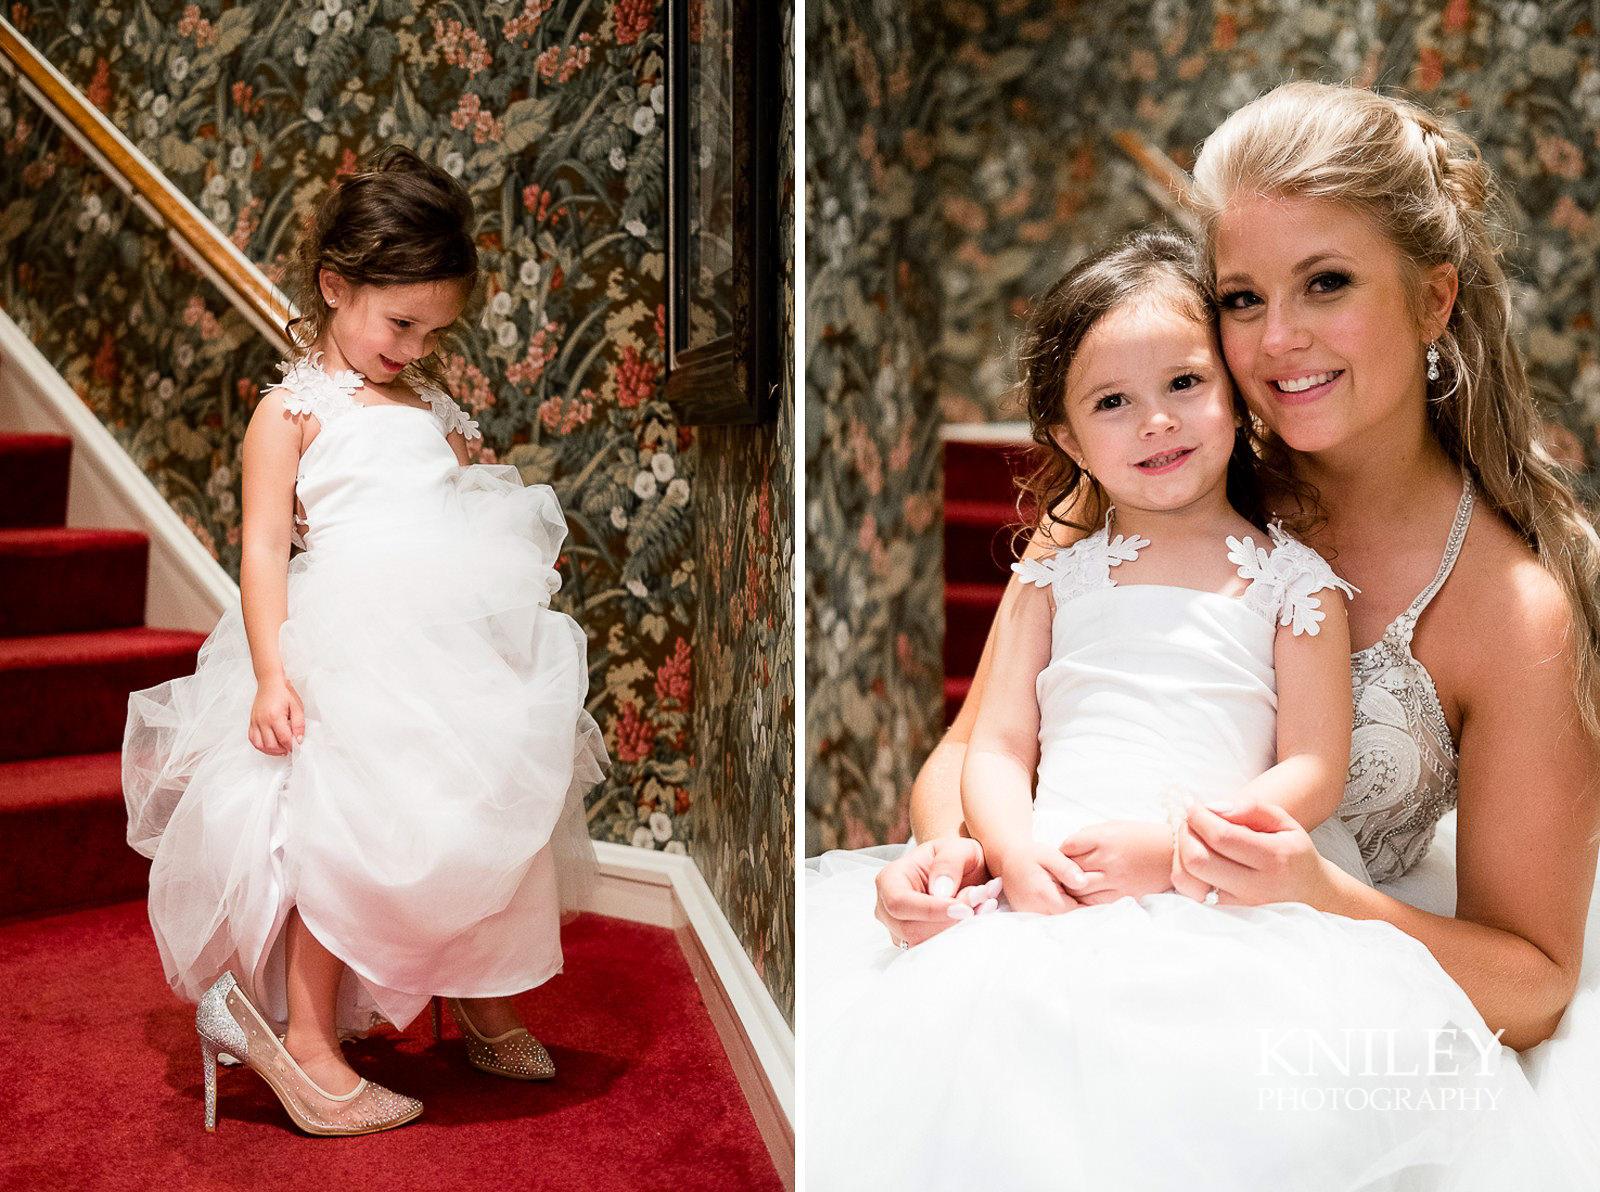 115 Buffalo NY wedding pictures - Sean Patrick Restaurant Wedding Reception - Getzville.jpg